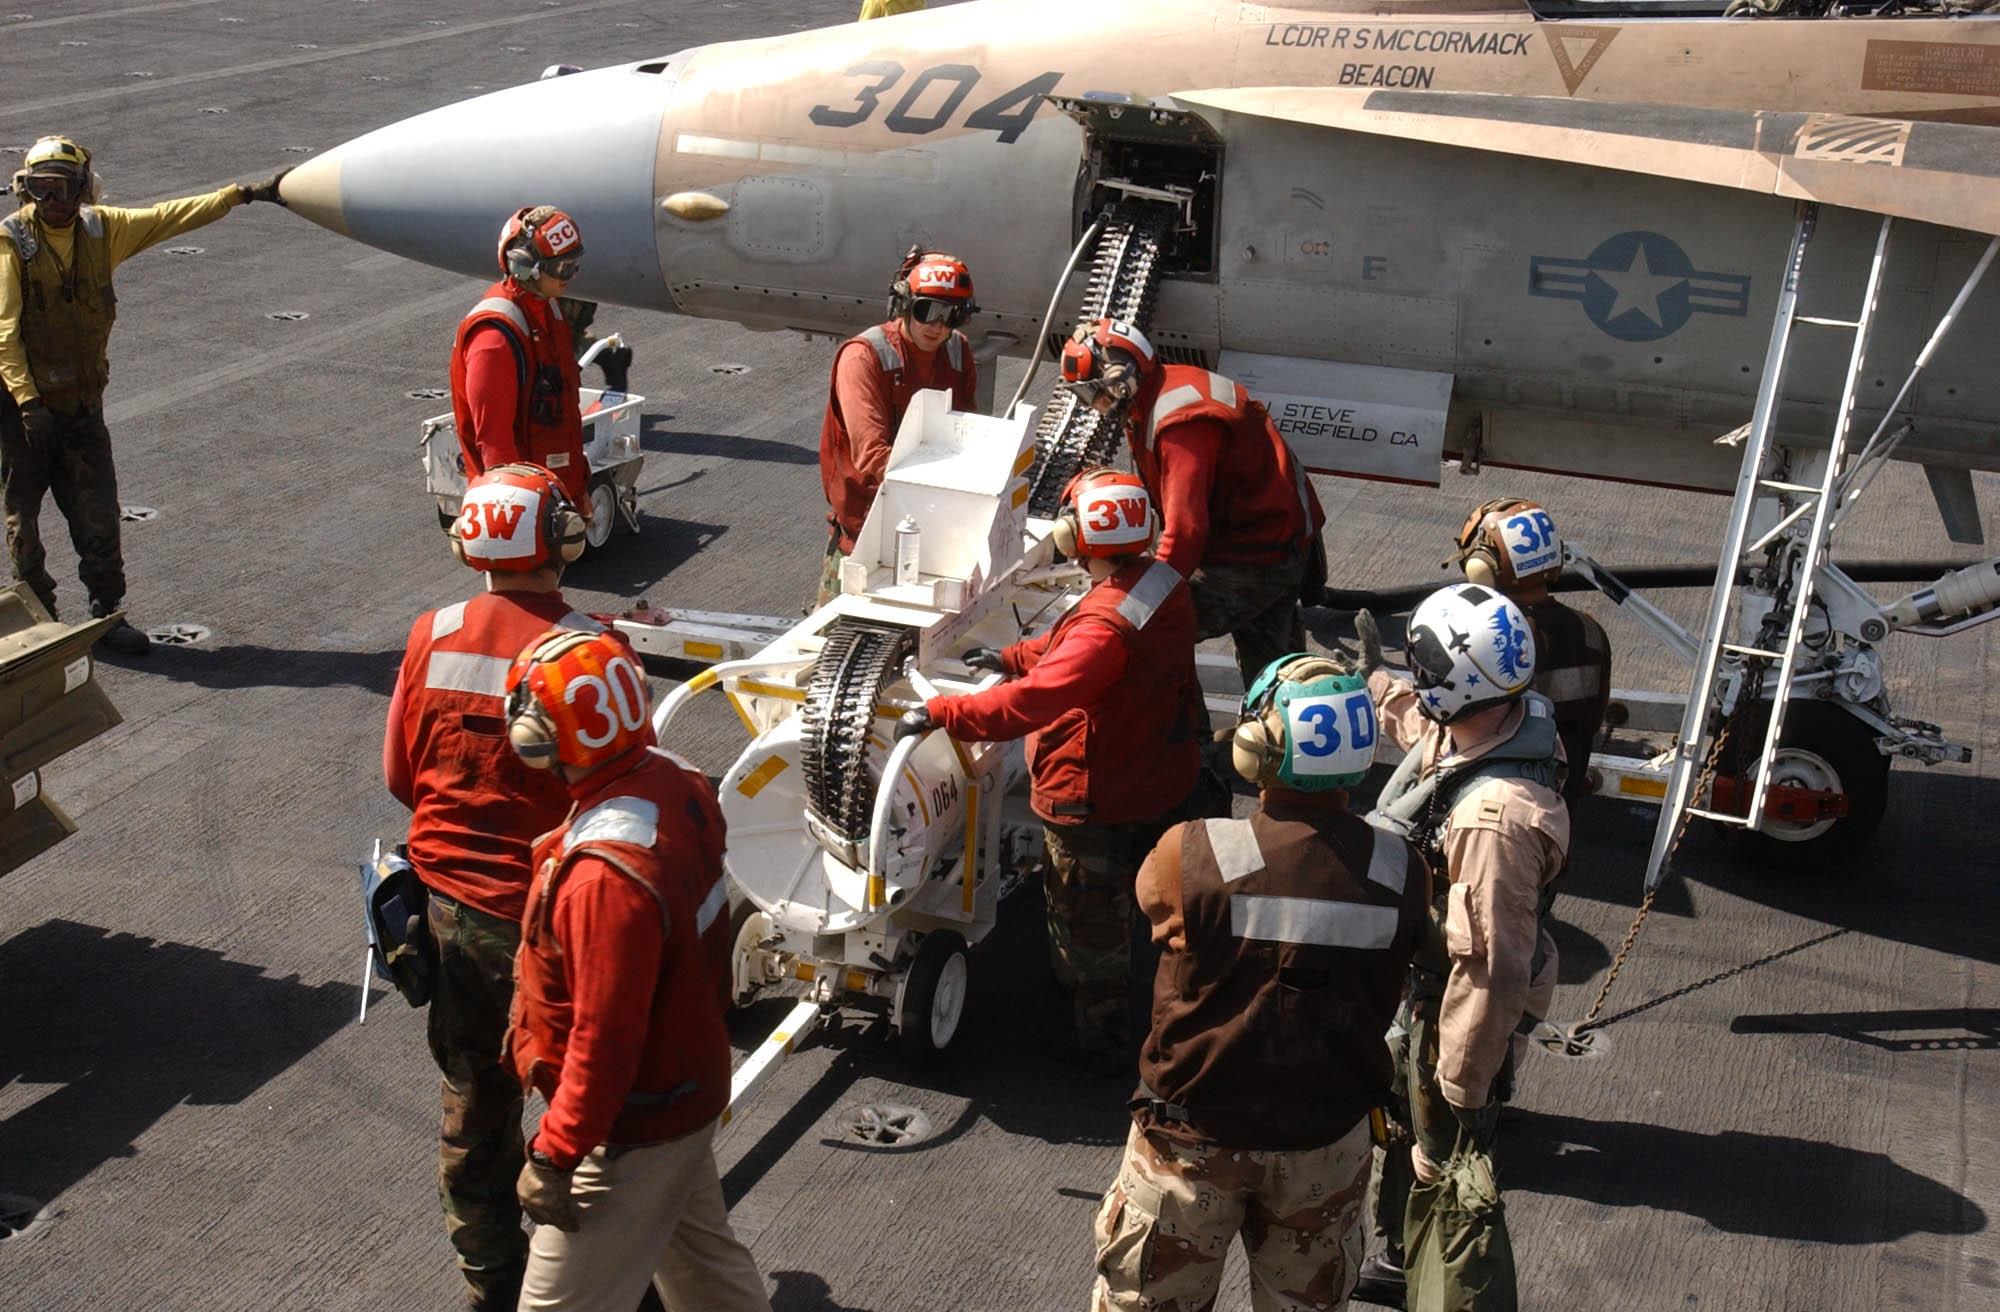 Bullet Size Chart For Reloading: US Navy 030417-N-4441P-003 Aviation Ordnancemen reload 20mm ,Chart